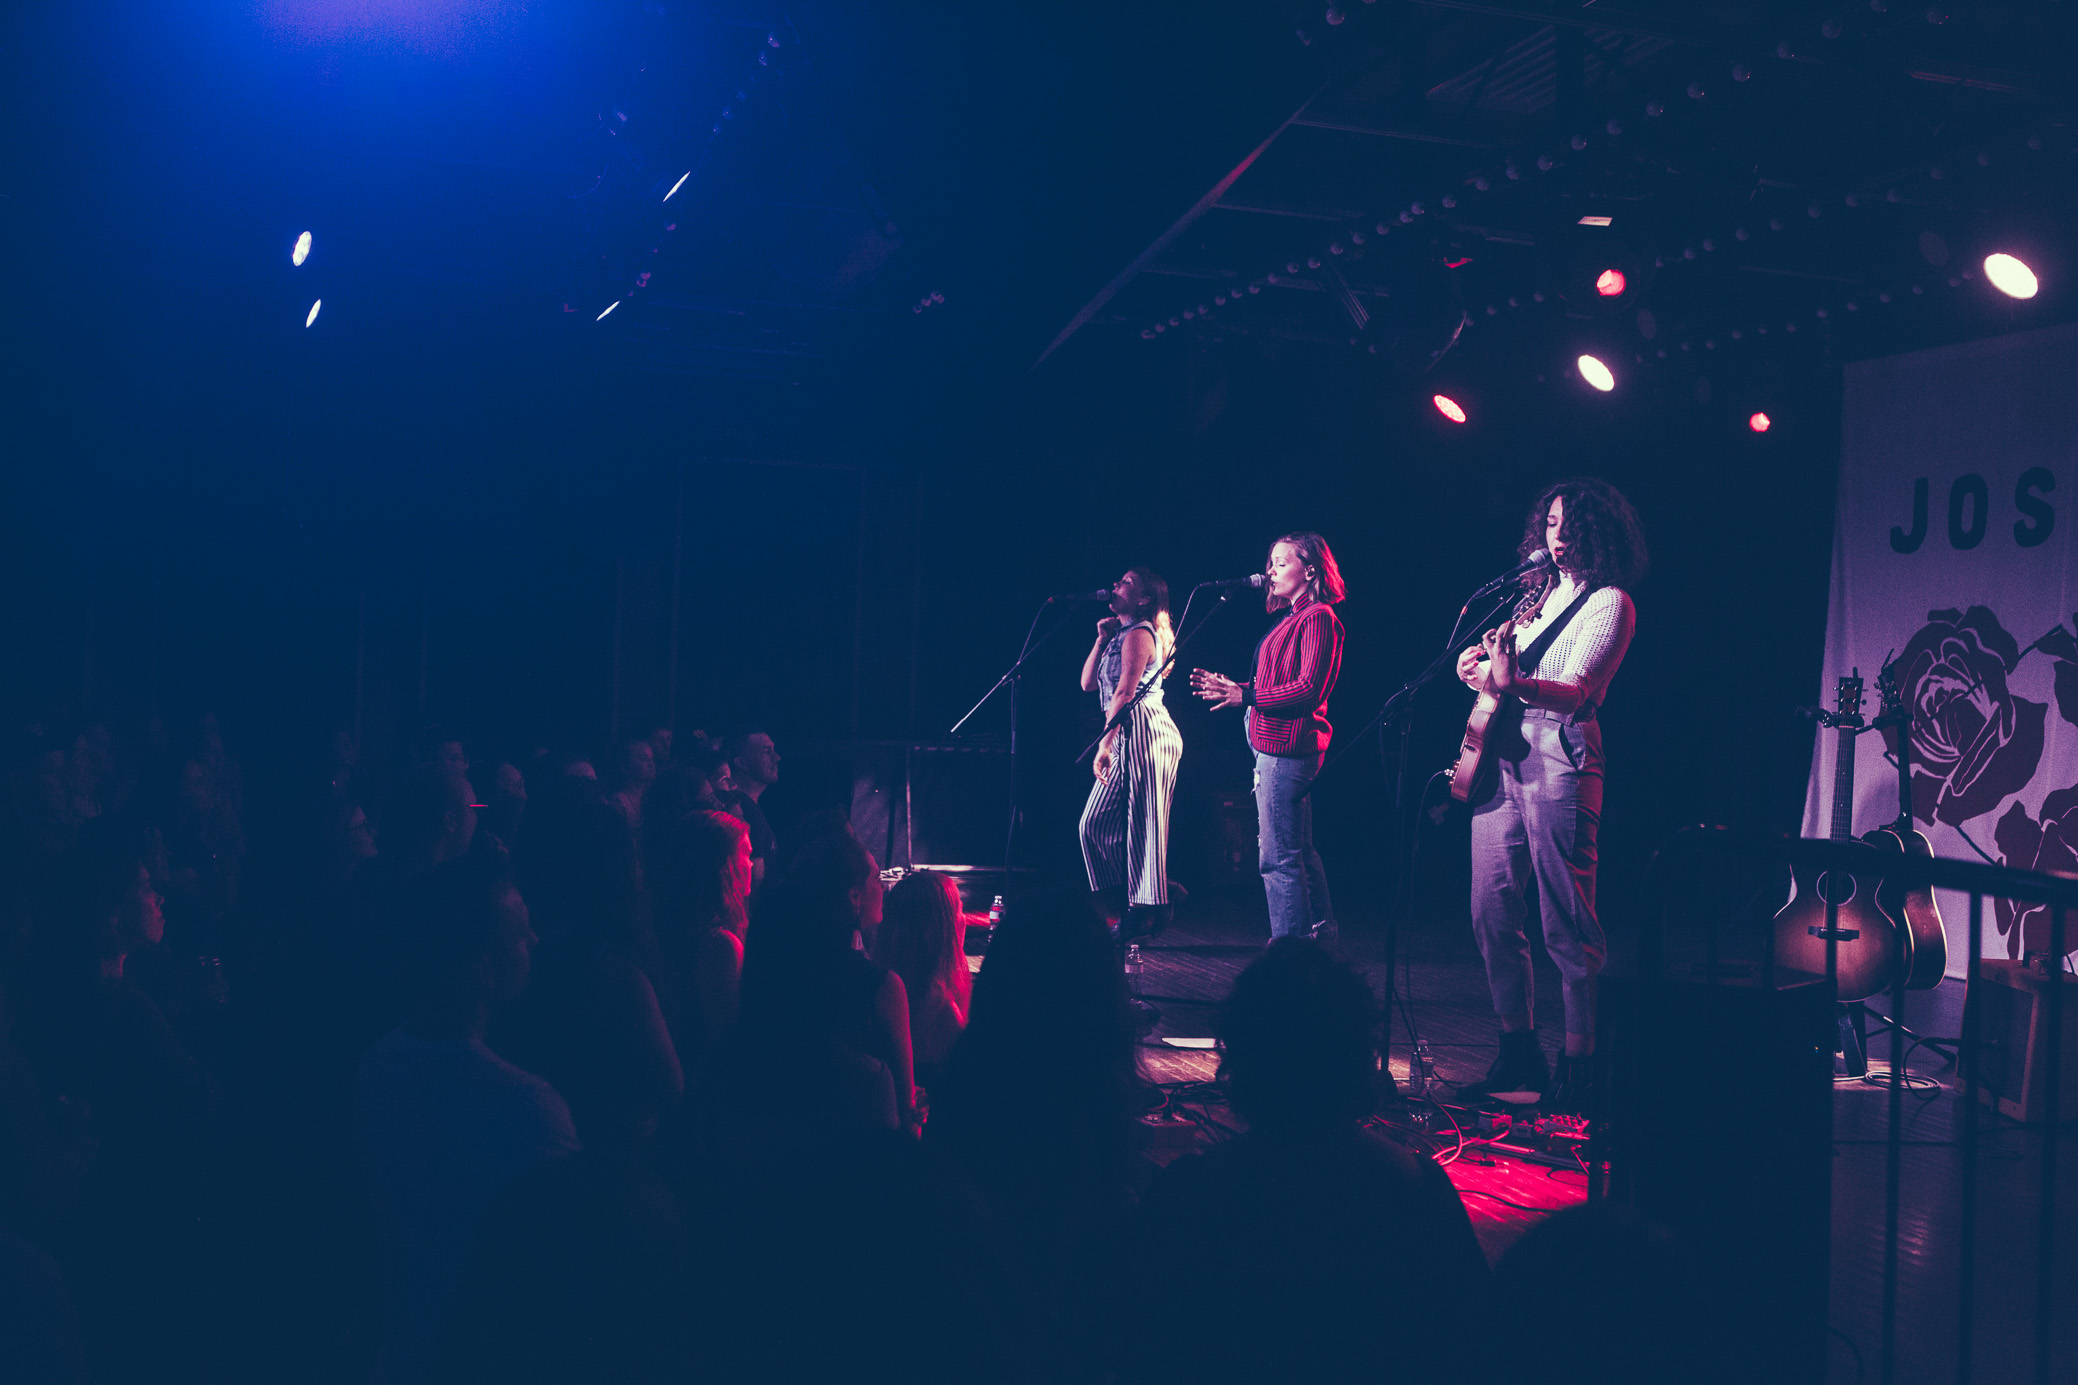 Allison, Meegan, and Natalie Closner of Joseph perform in concert at Saturn Birmingham in Birmingham, Alabama on September 6th, 2018. (Photo by David A. Smith/DSmithScenes)